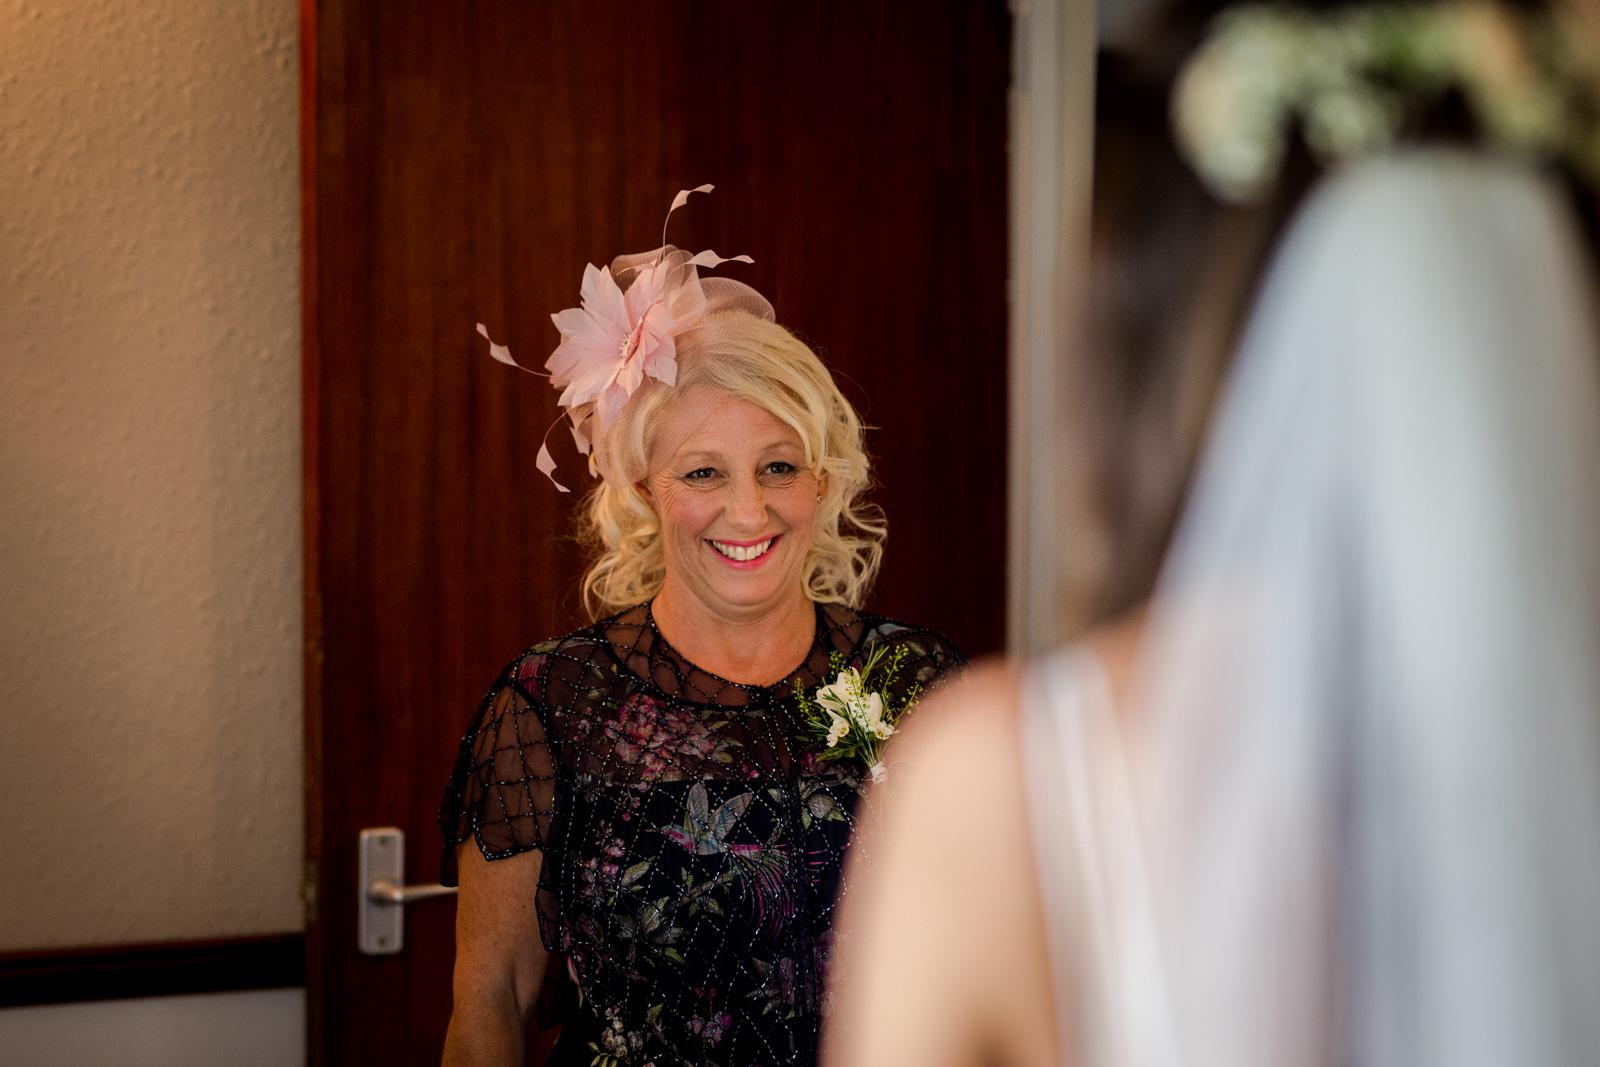 Rookery Farm Wedding in Bedfordshire